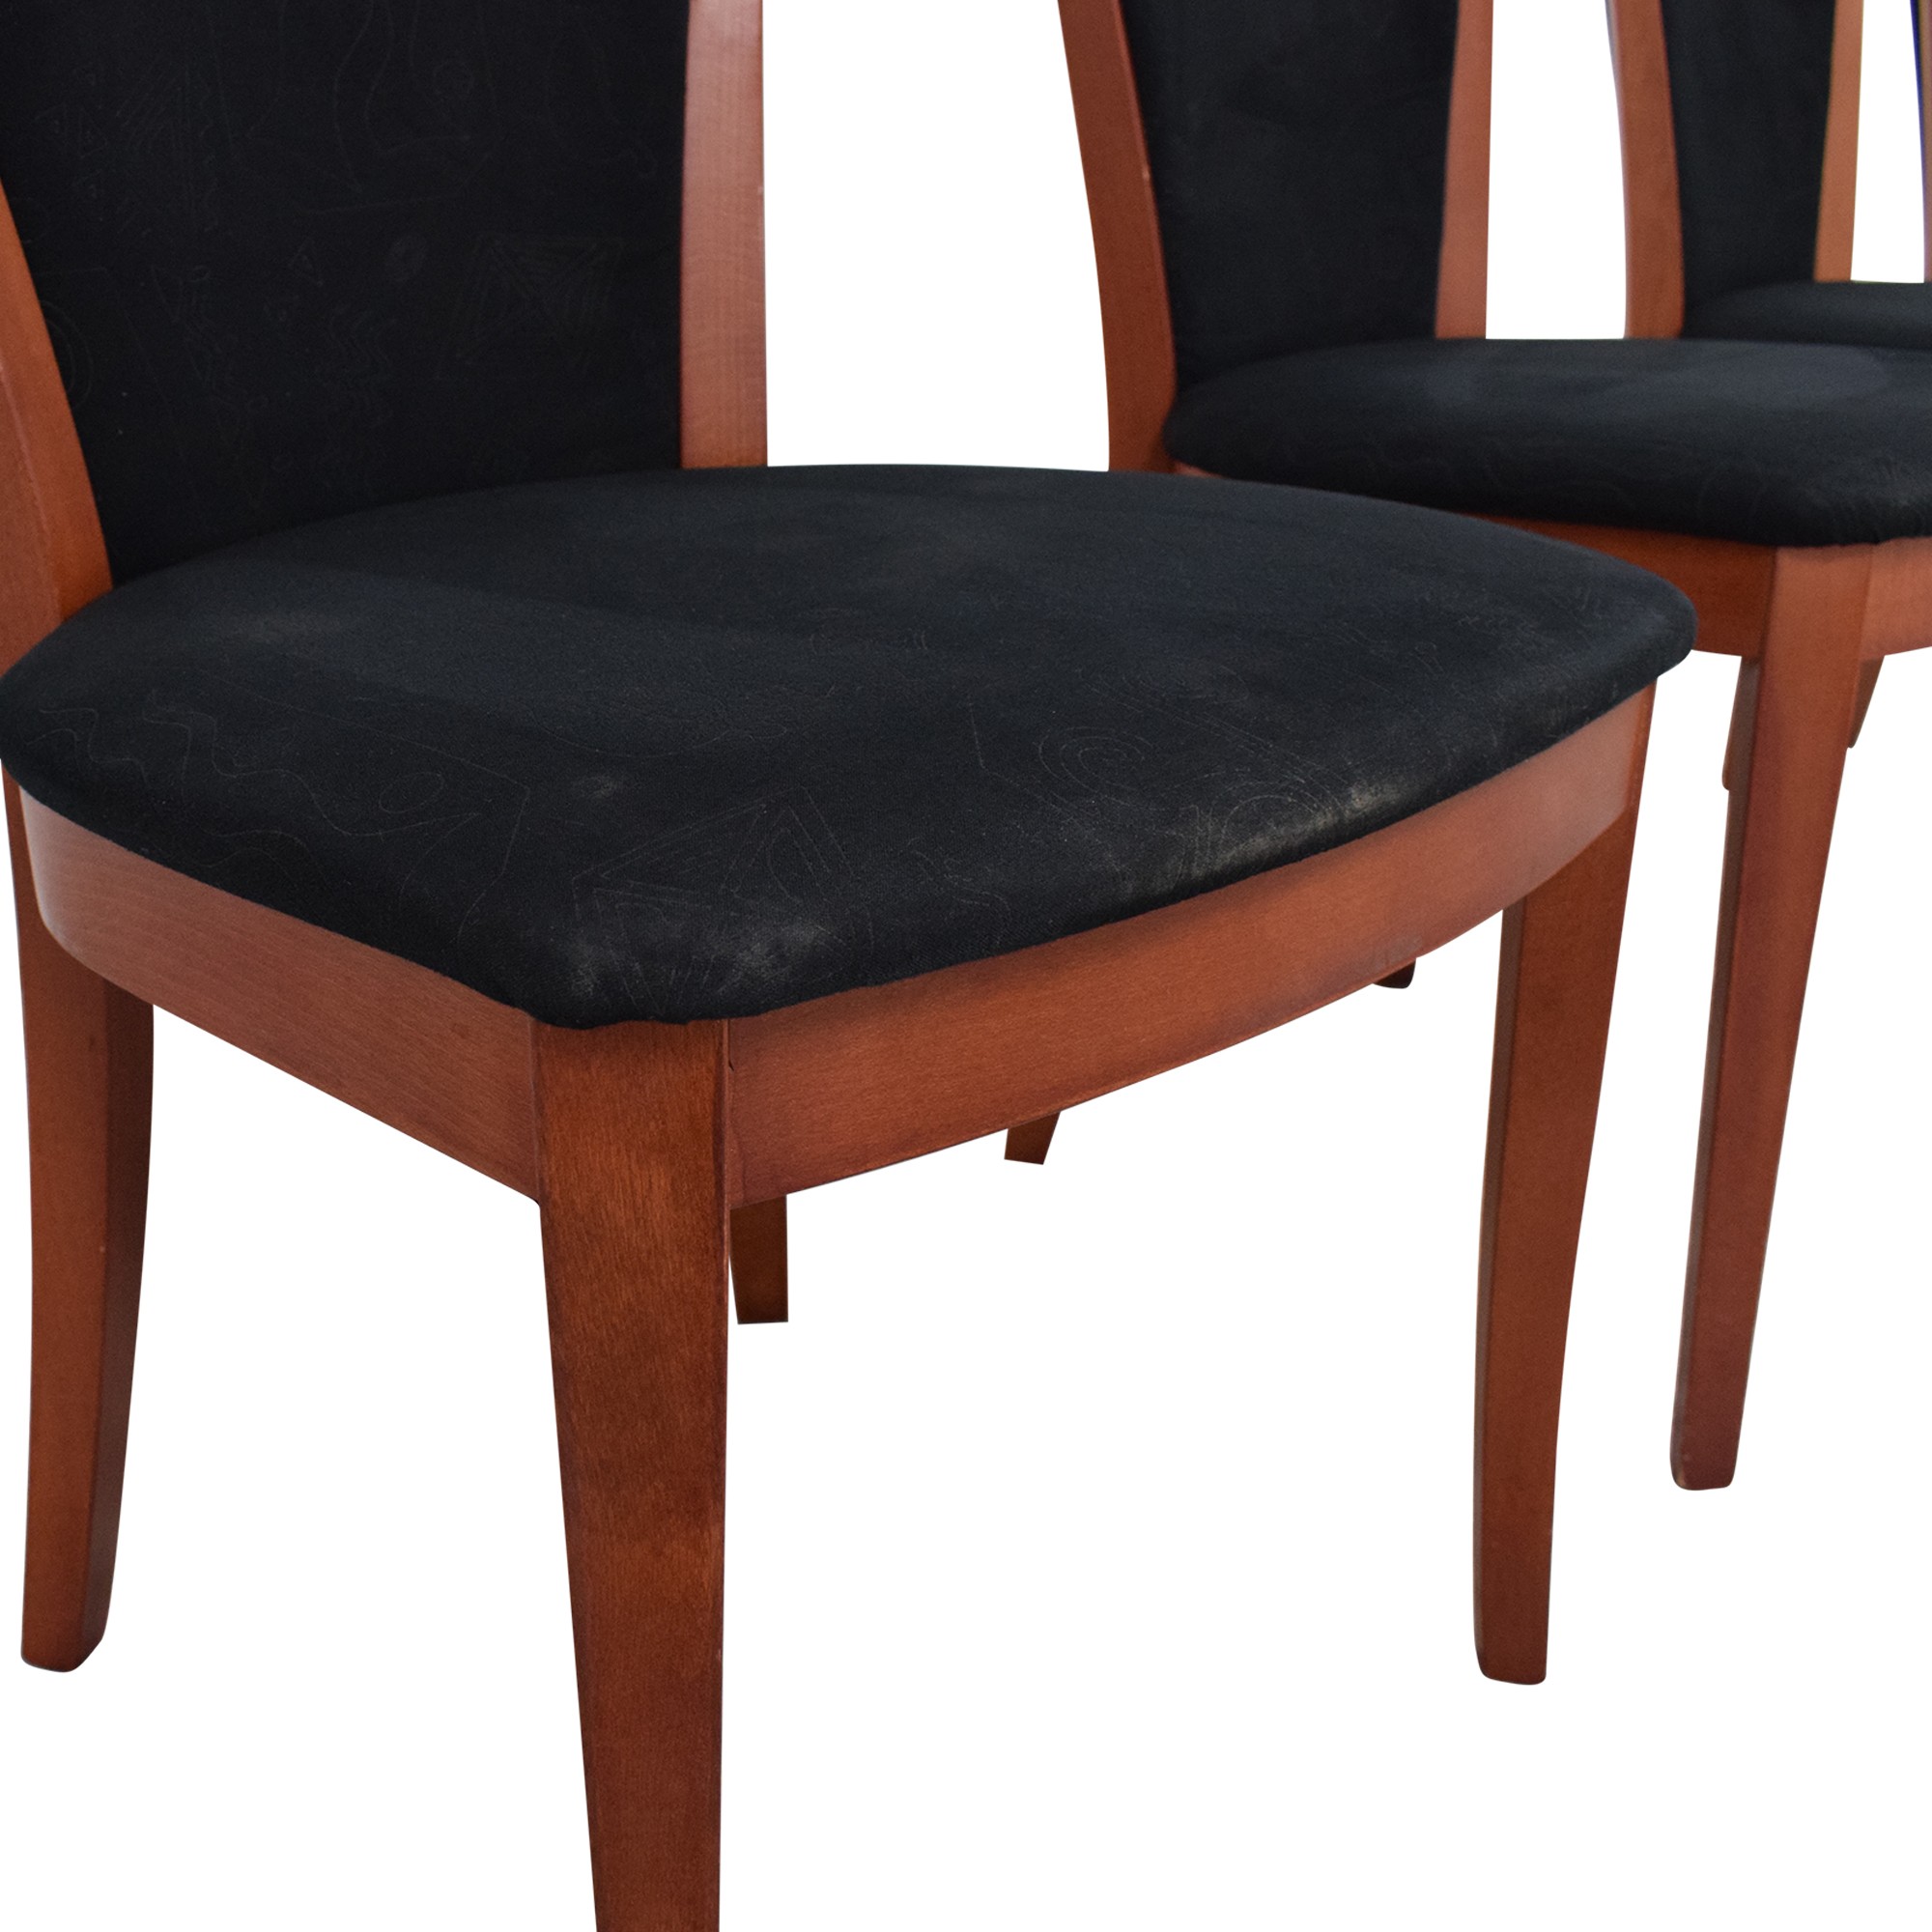 SA A. Sibau SA A. Sibau Dining Chairs dimensions